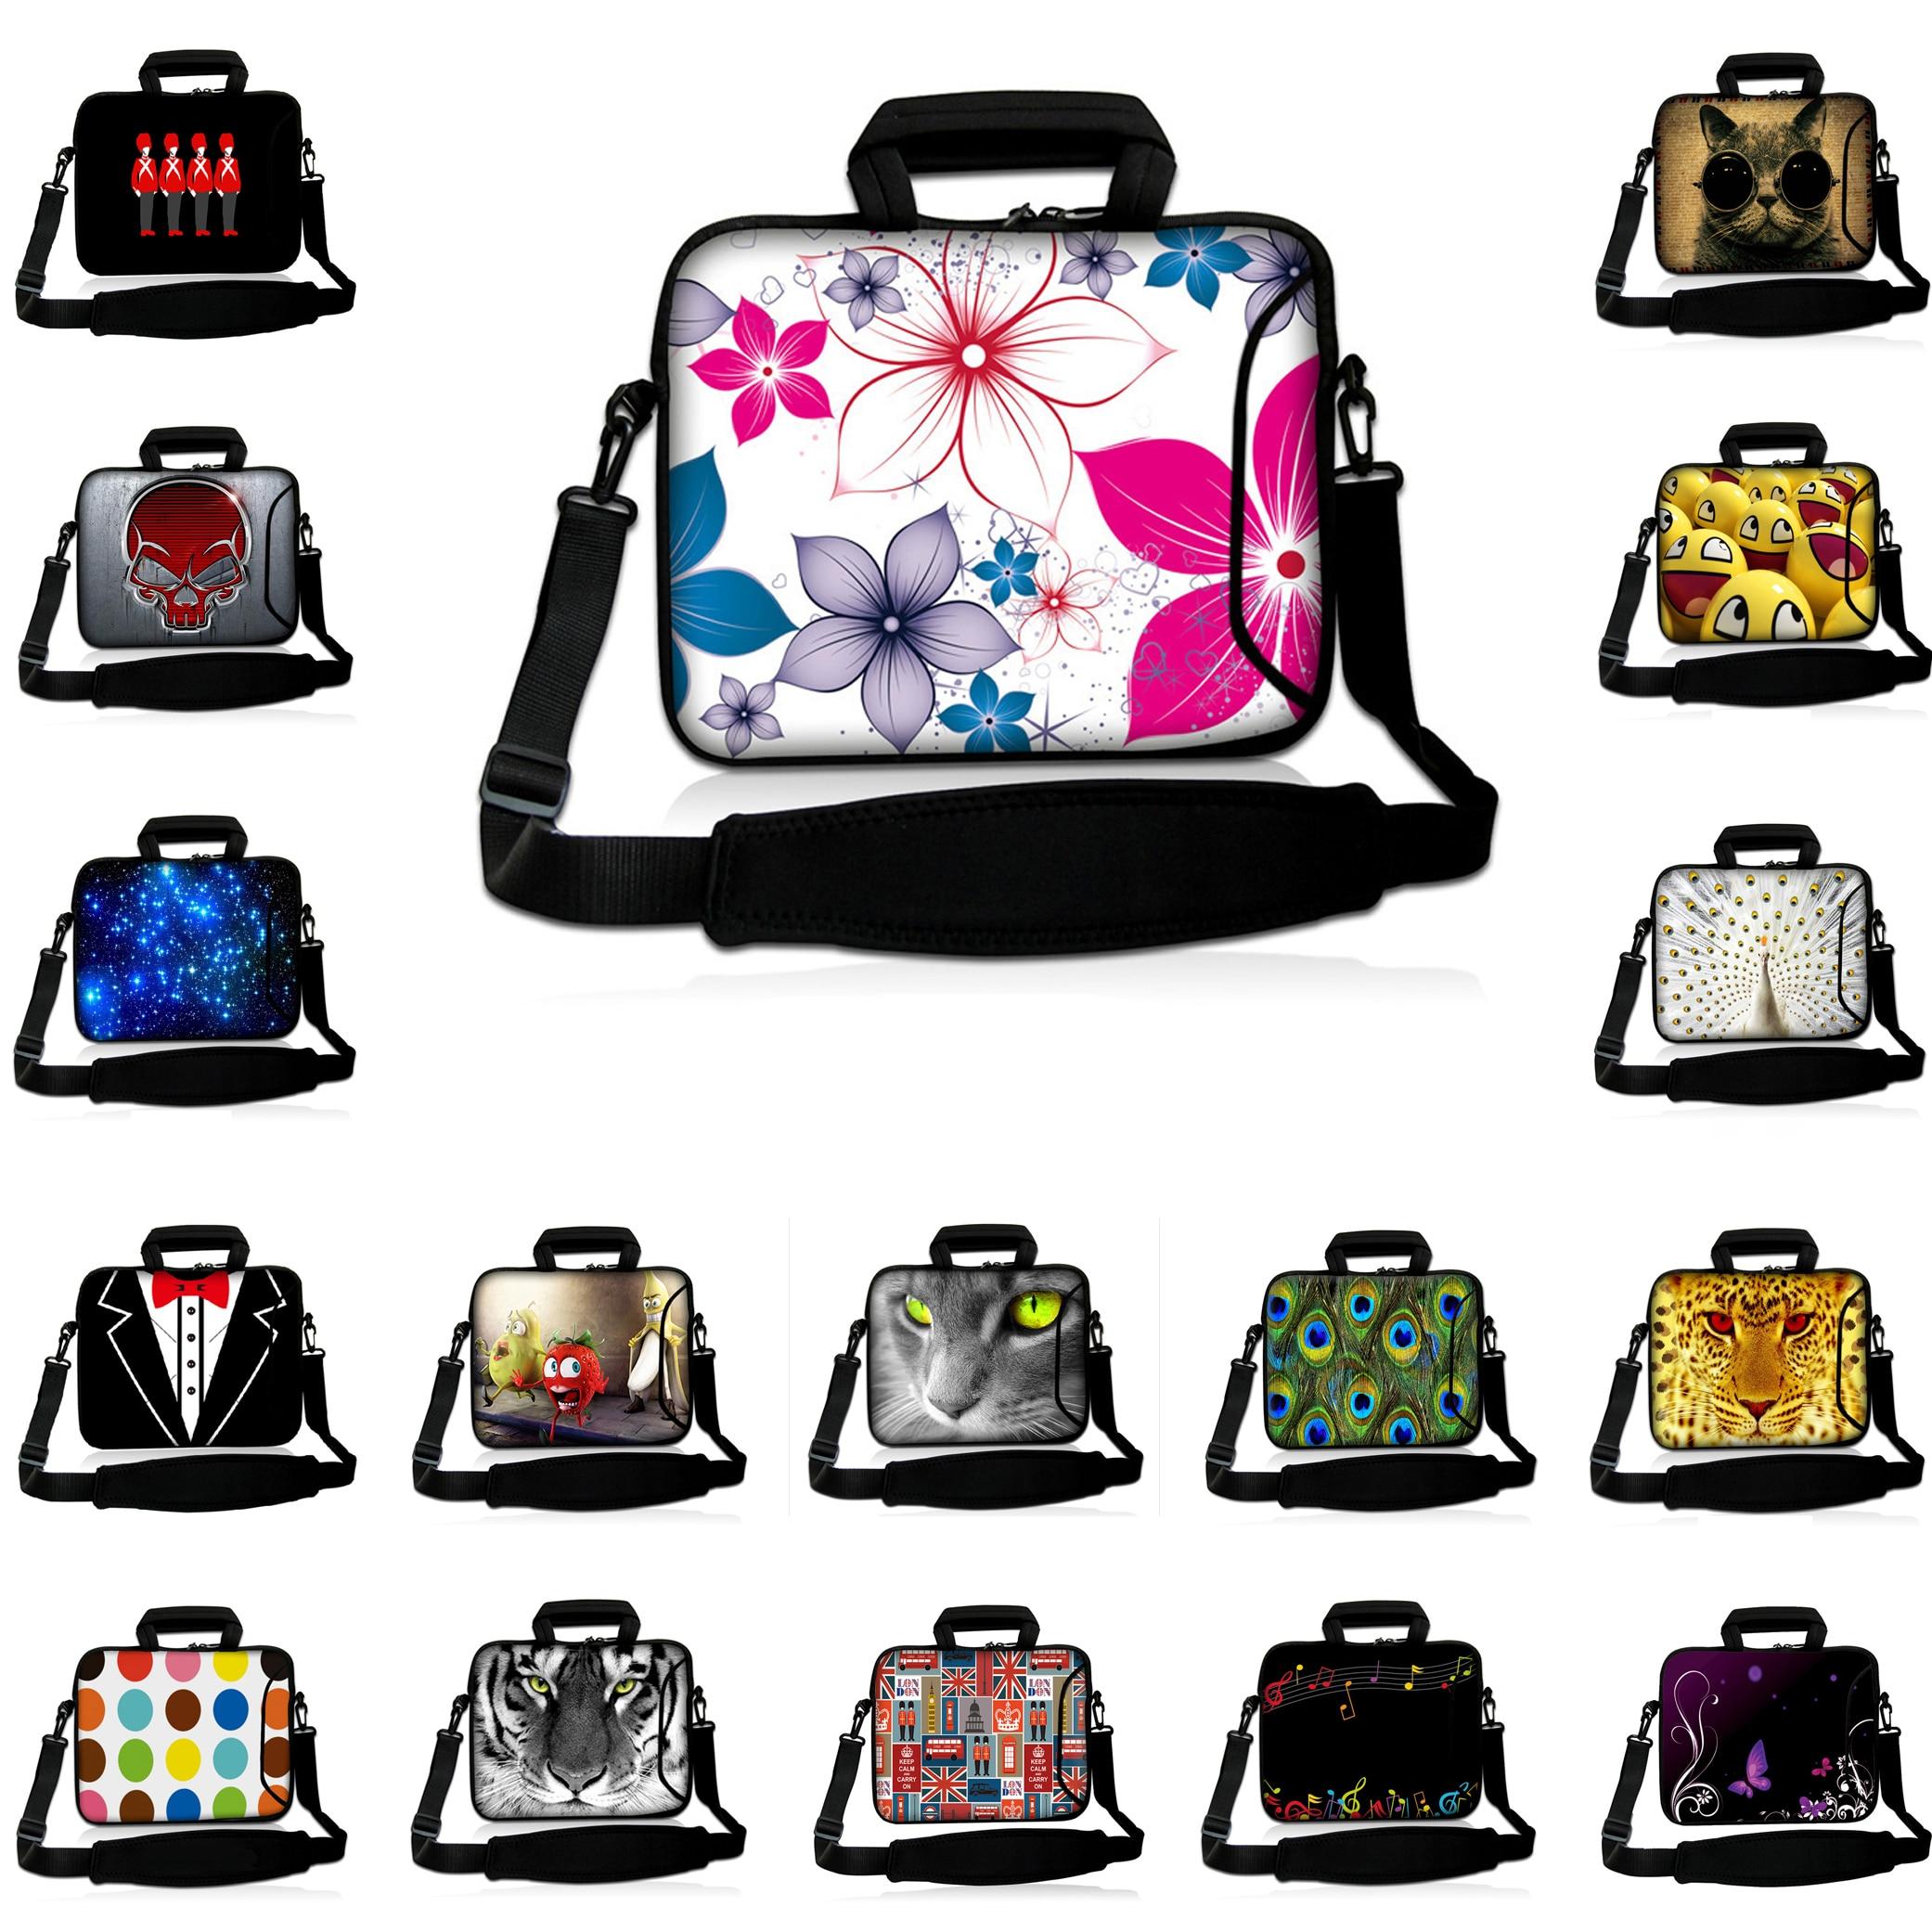 New Notebook Computer Bag For Women 16.8 Slim Portable Briefcase Shoulder Laptop Bags 17.4 17.3 17 Messenger Case For Macbook